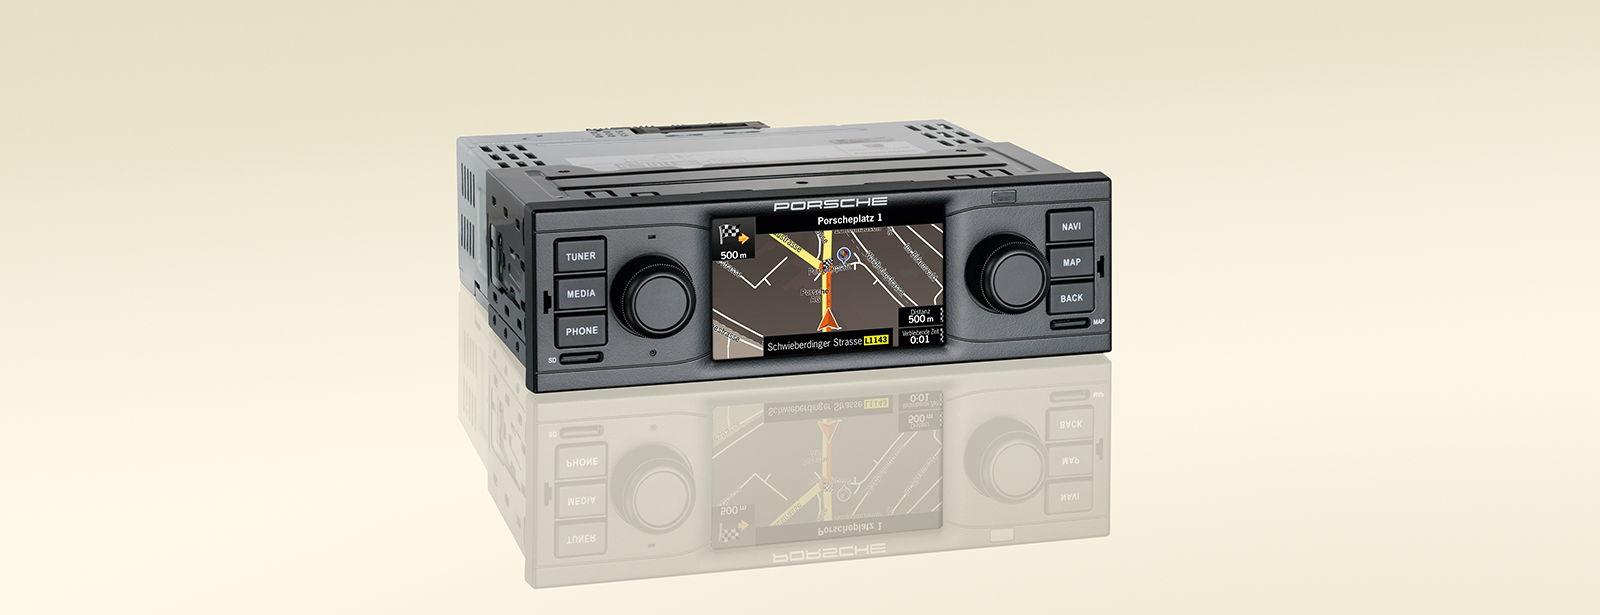 Porsche classic radio navigation system analogue driving pleasure with digital tech